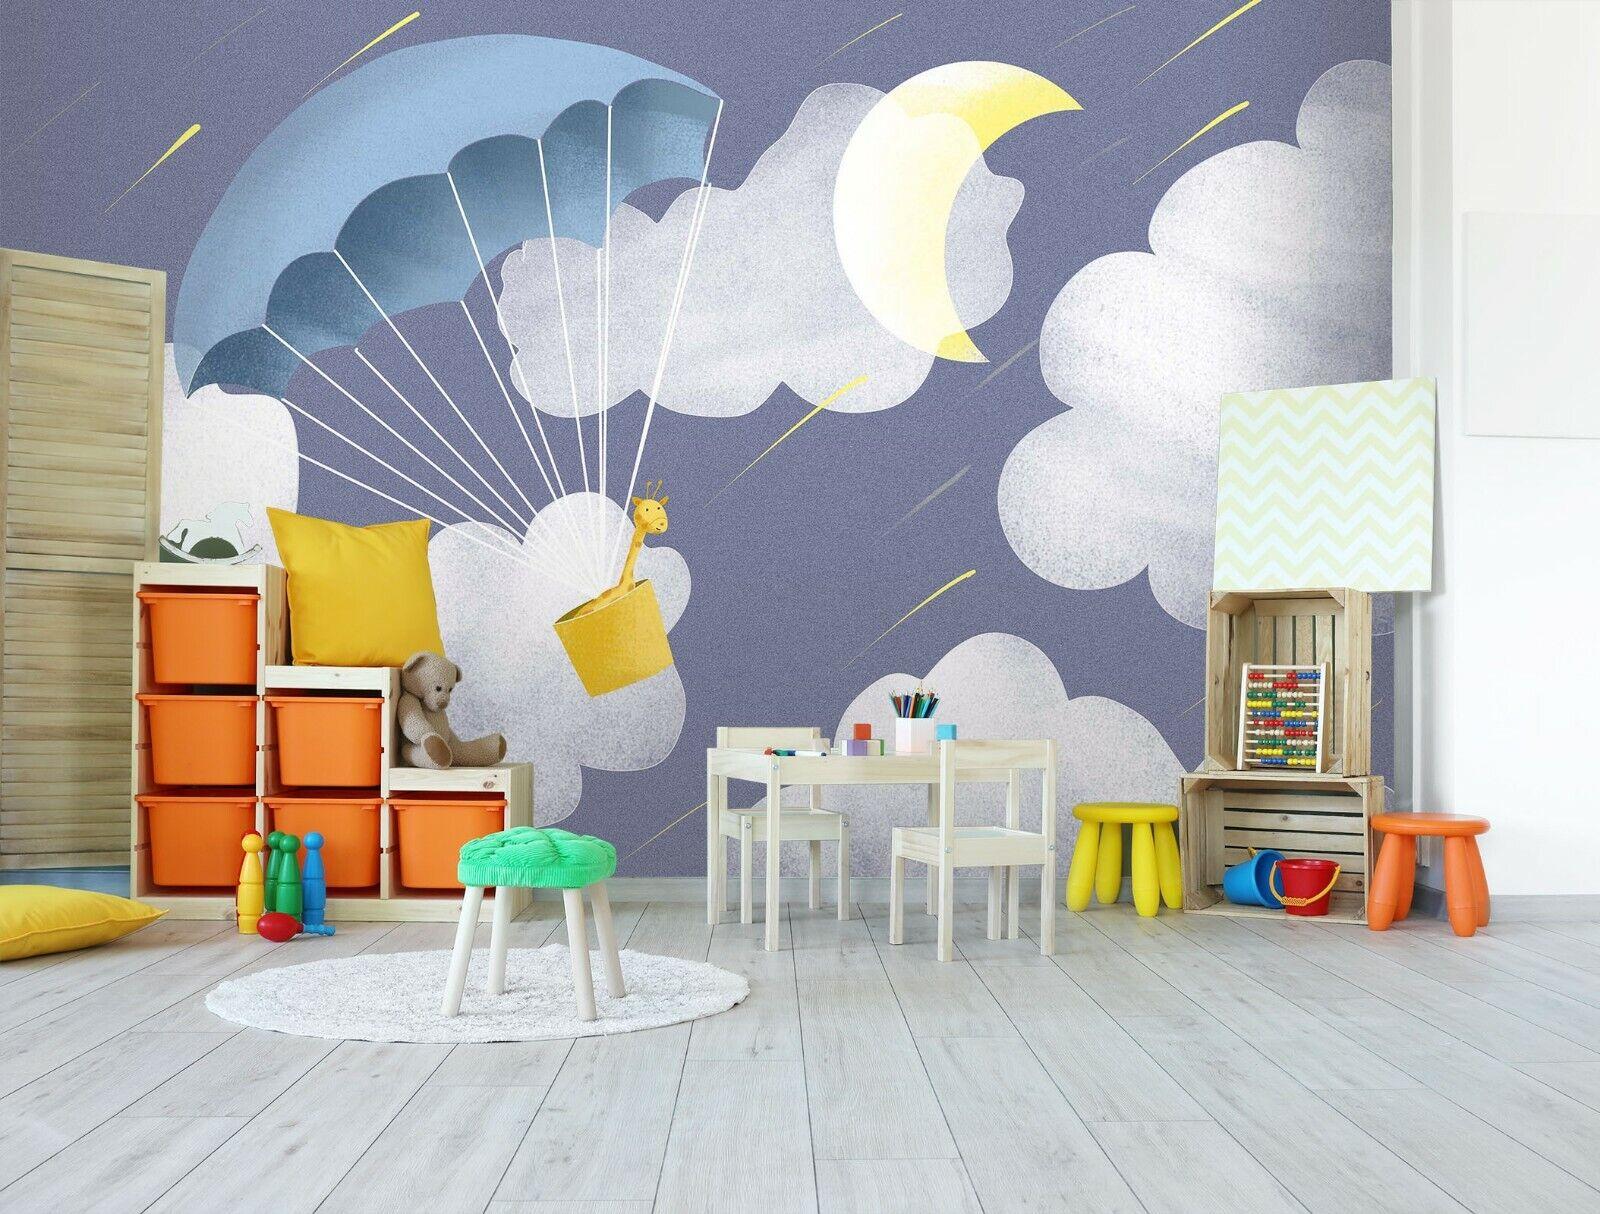 3D CKunstoon Balloon R283 Business WandPapier Wand Mural Self-adhesive Commerce An